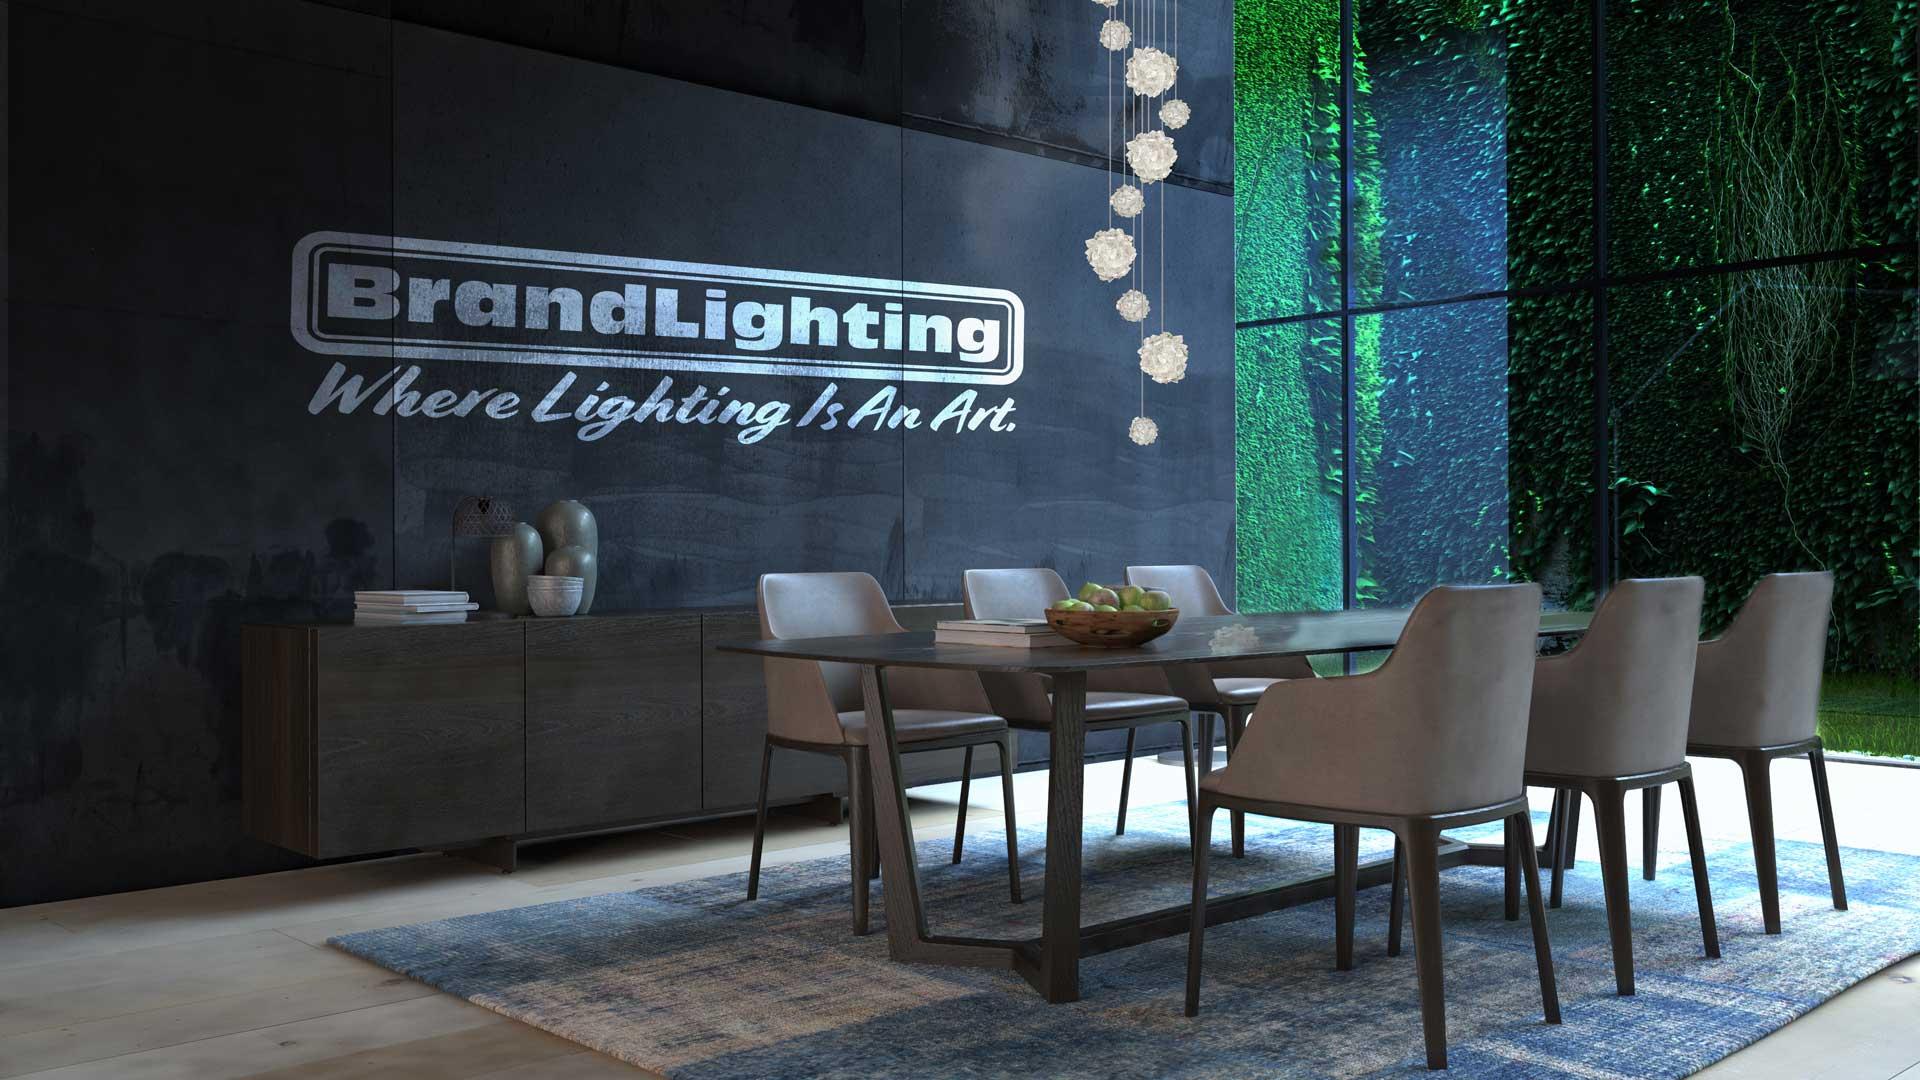 Tech Lighting Monorail Lighting Systems 888 991 3610